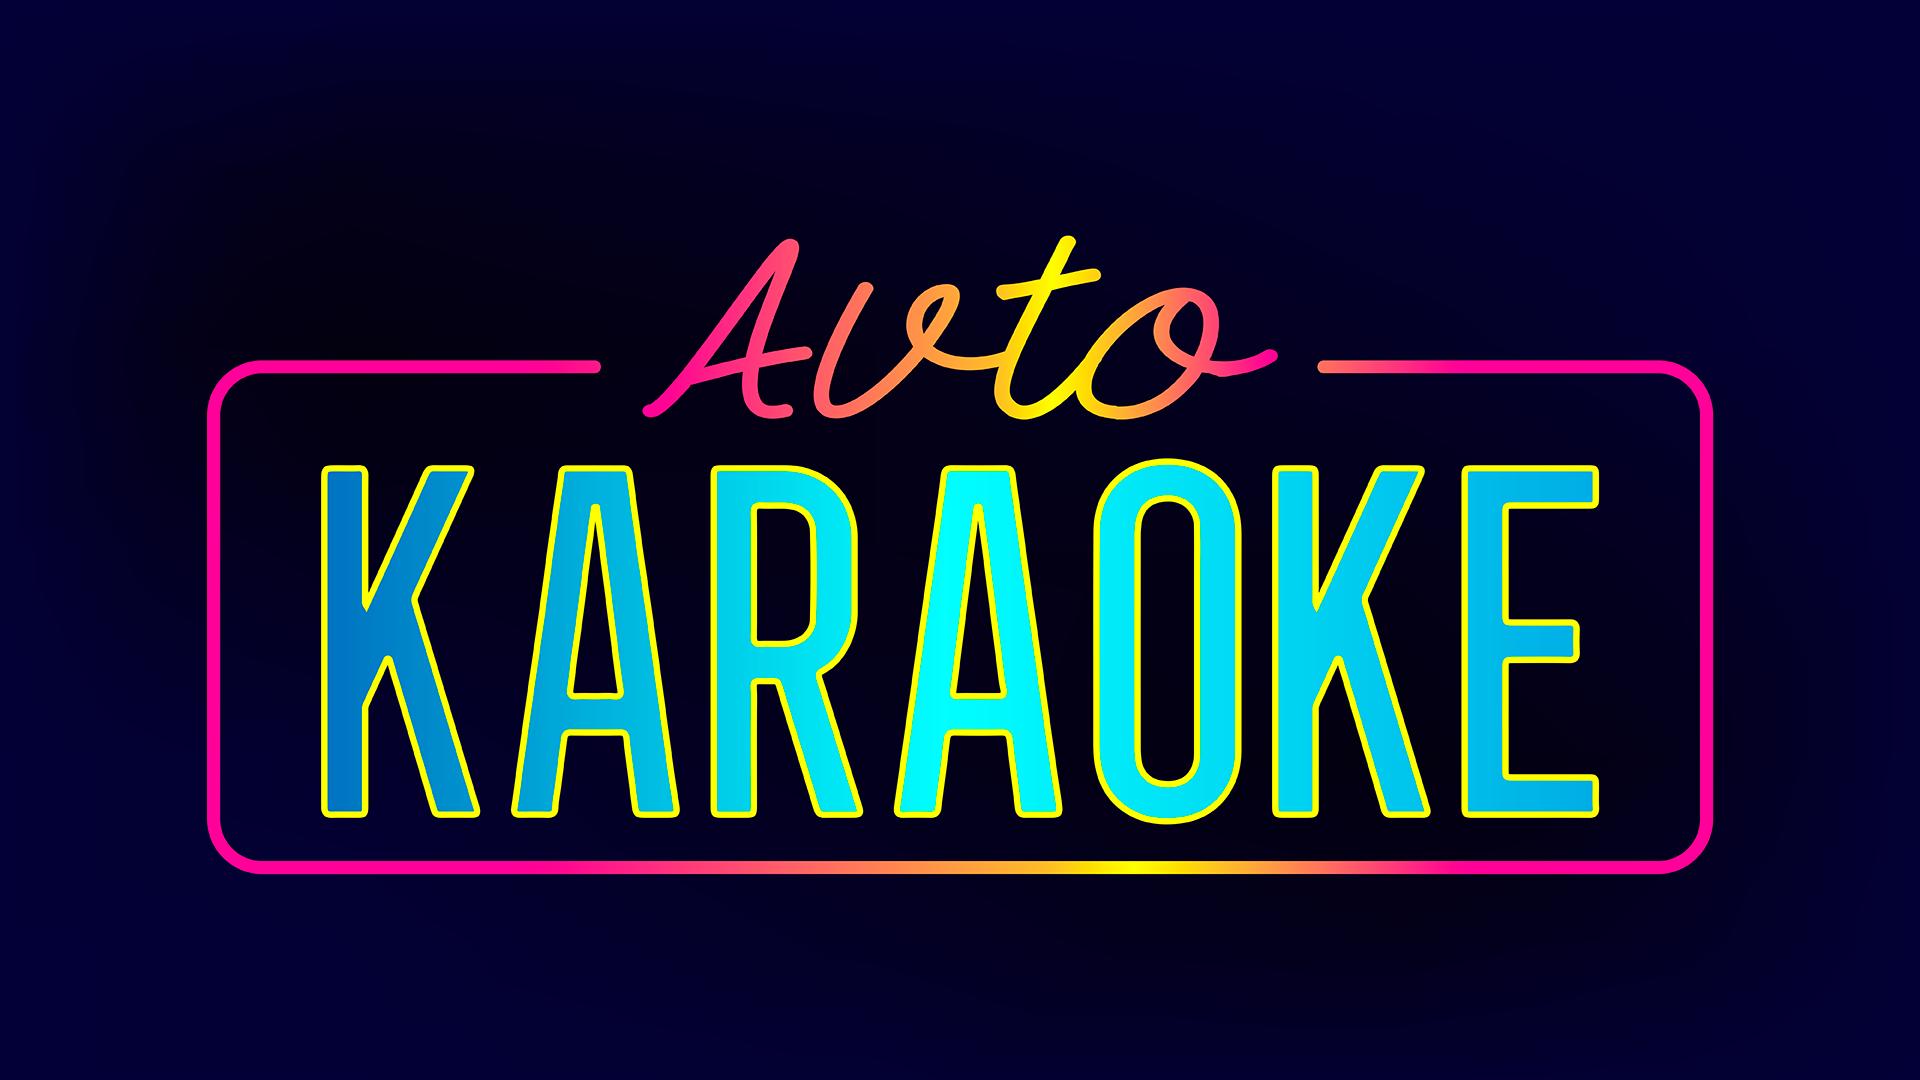 auto karaoke